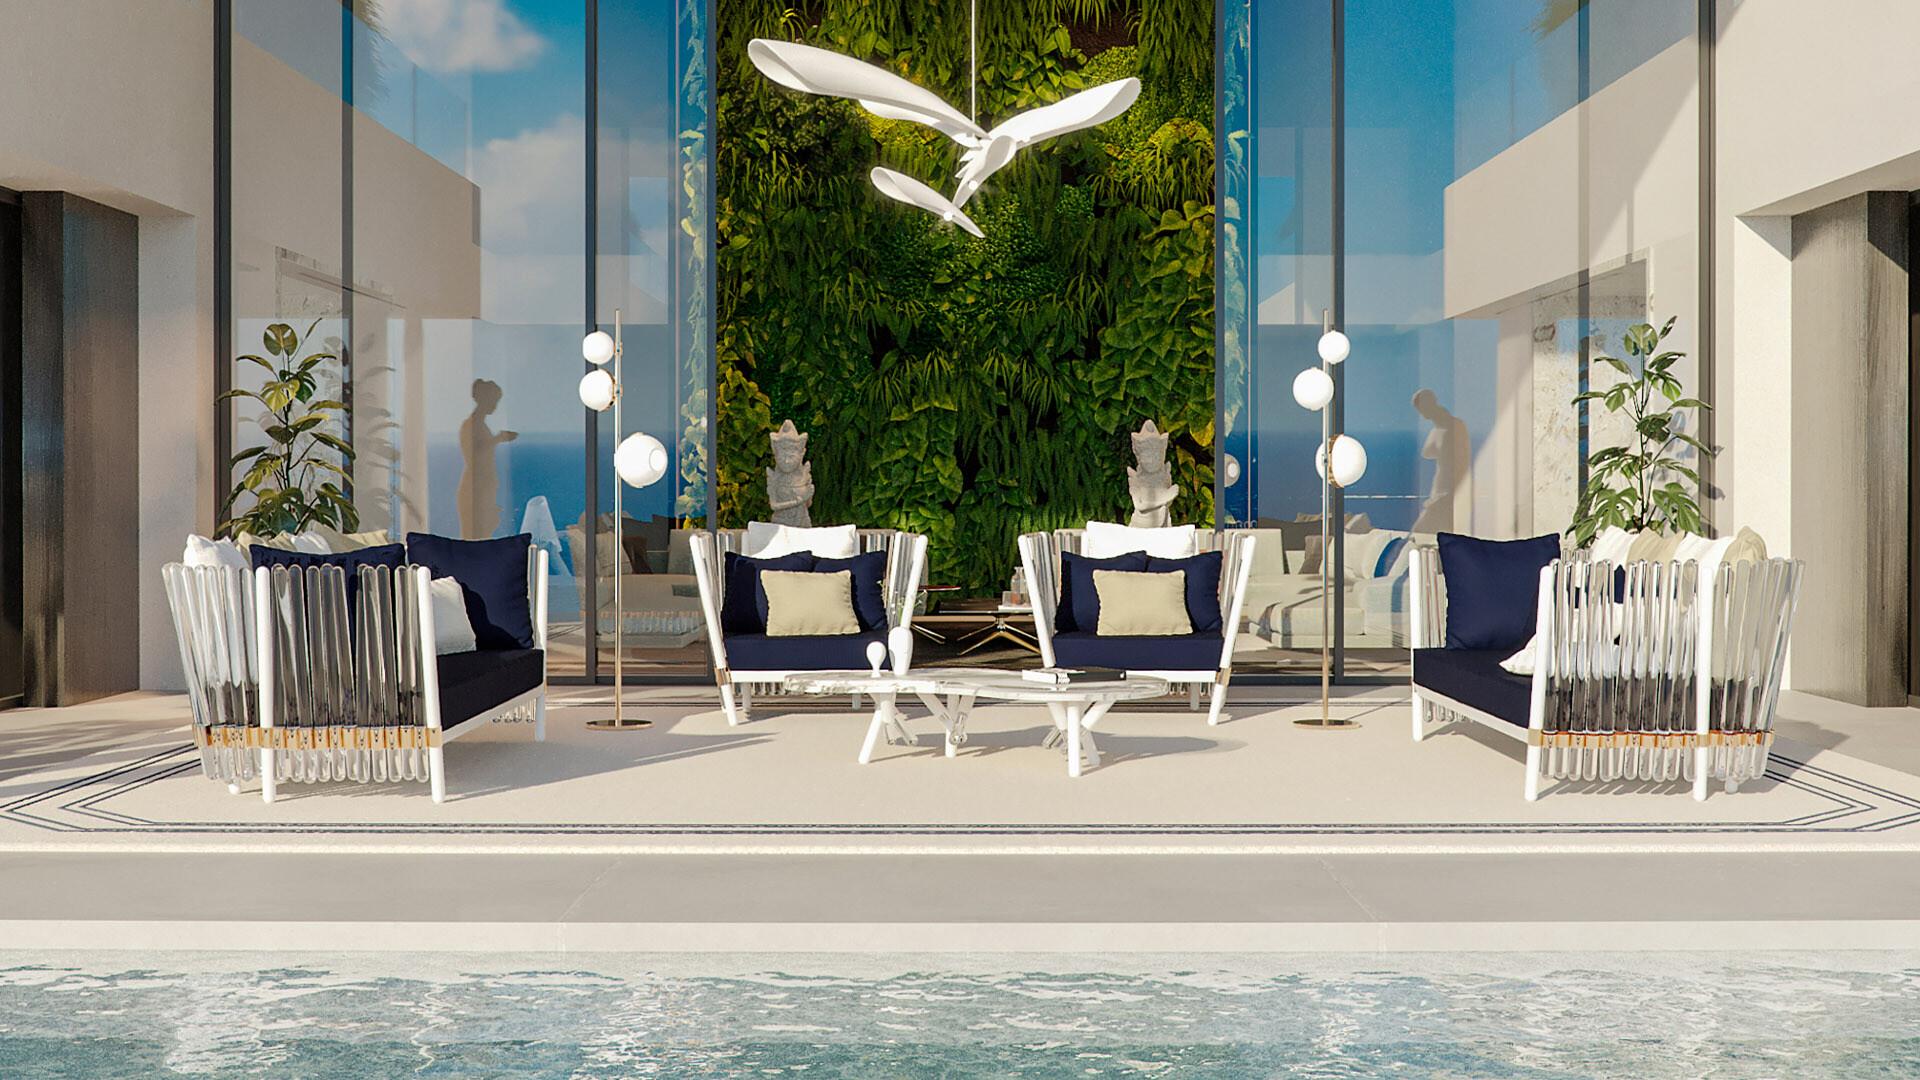 myface-miami-luxury-residence (3)